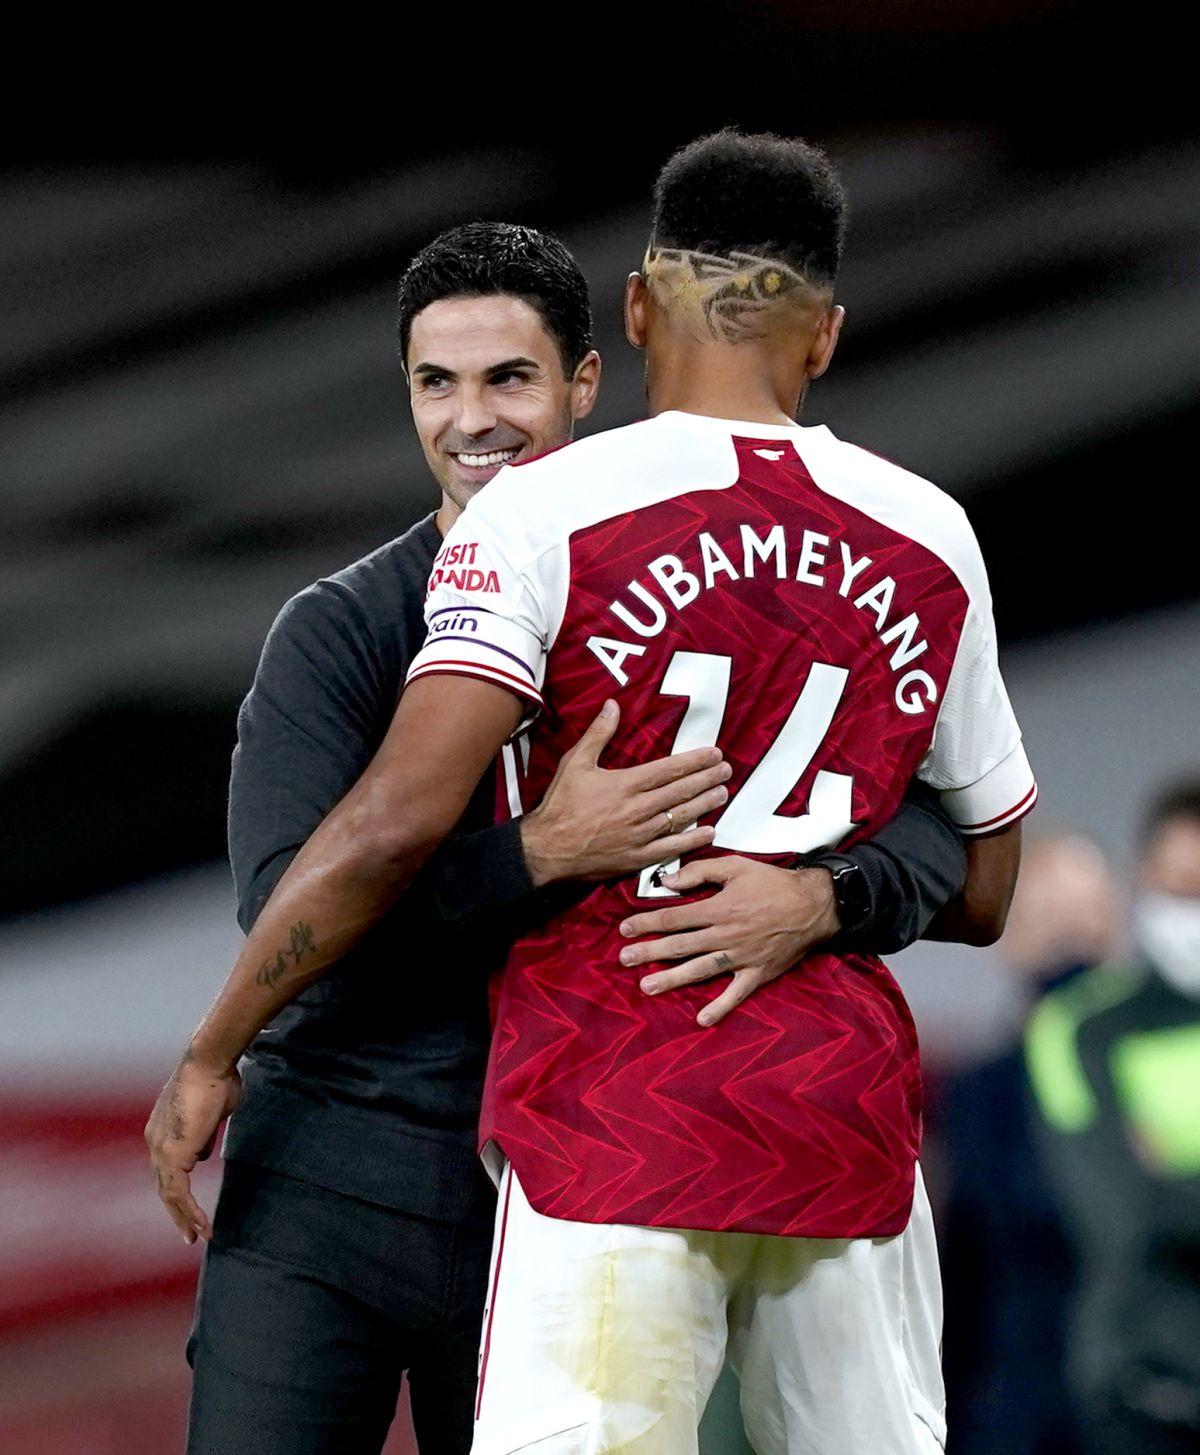 There has been a 'click' with Arsenal captain Pierre-Emerick Aubameyang – Arteta